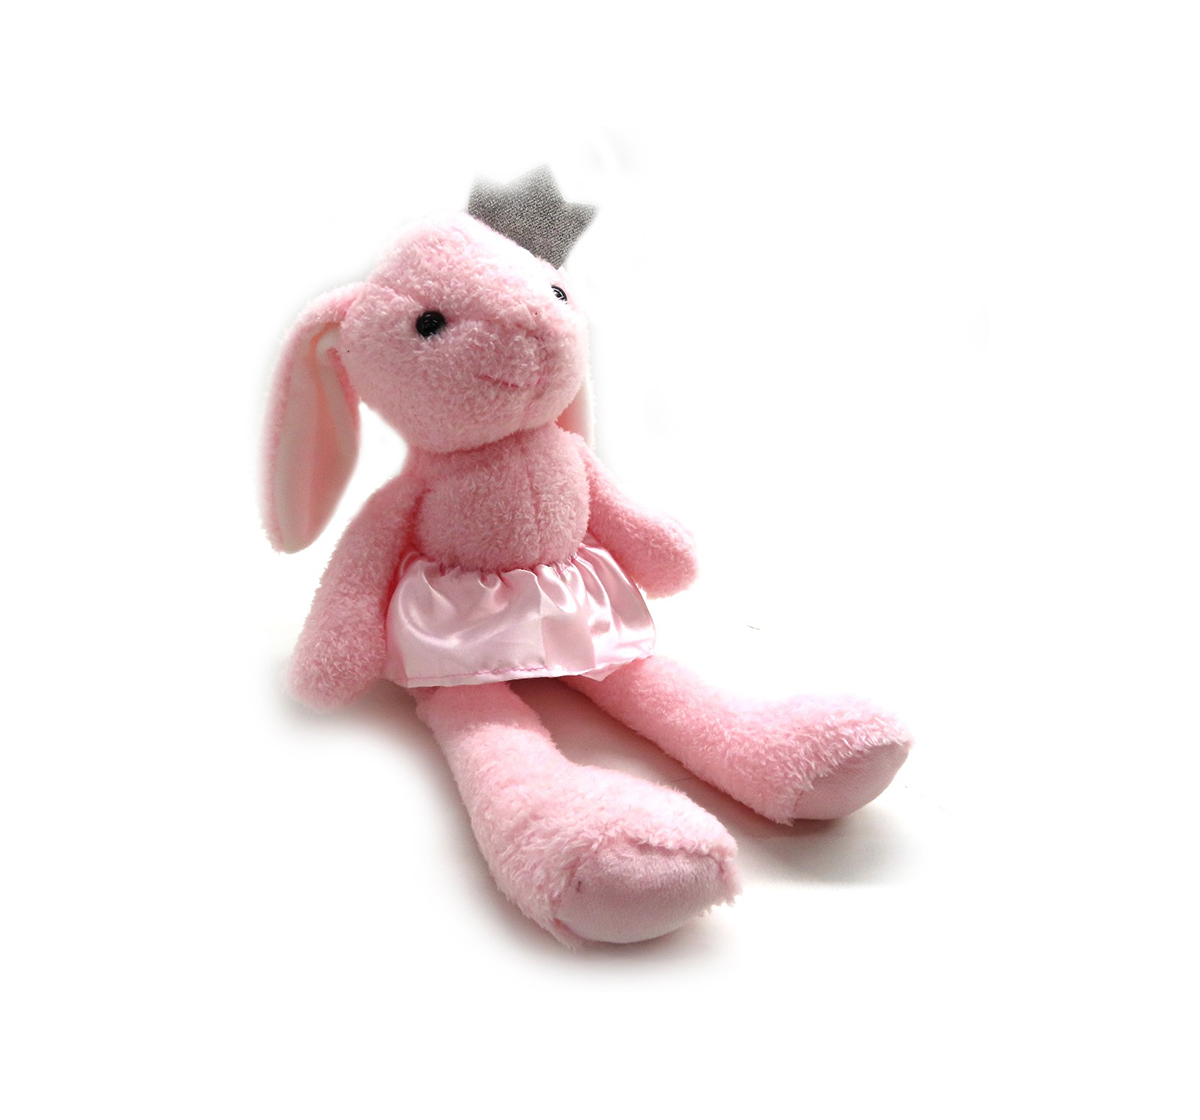 Fuzzbuzz | Fuzzbuzz Rabbit Soft Plush Toy - Pink - 40Cm Quirky Soft Toys for Kids age 0M+ - 10 Cm (Pink)